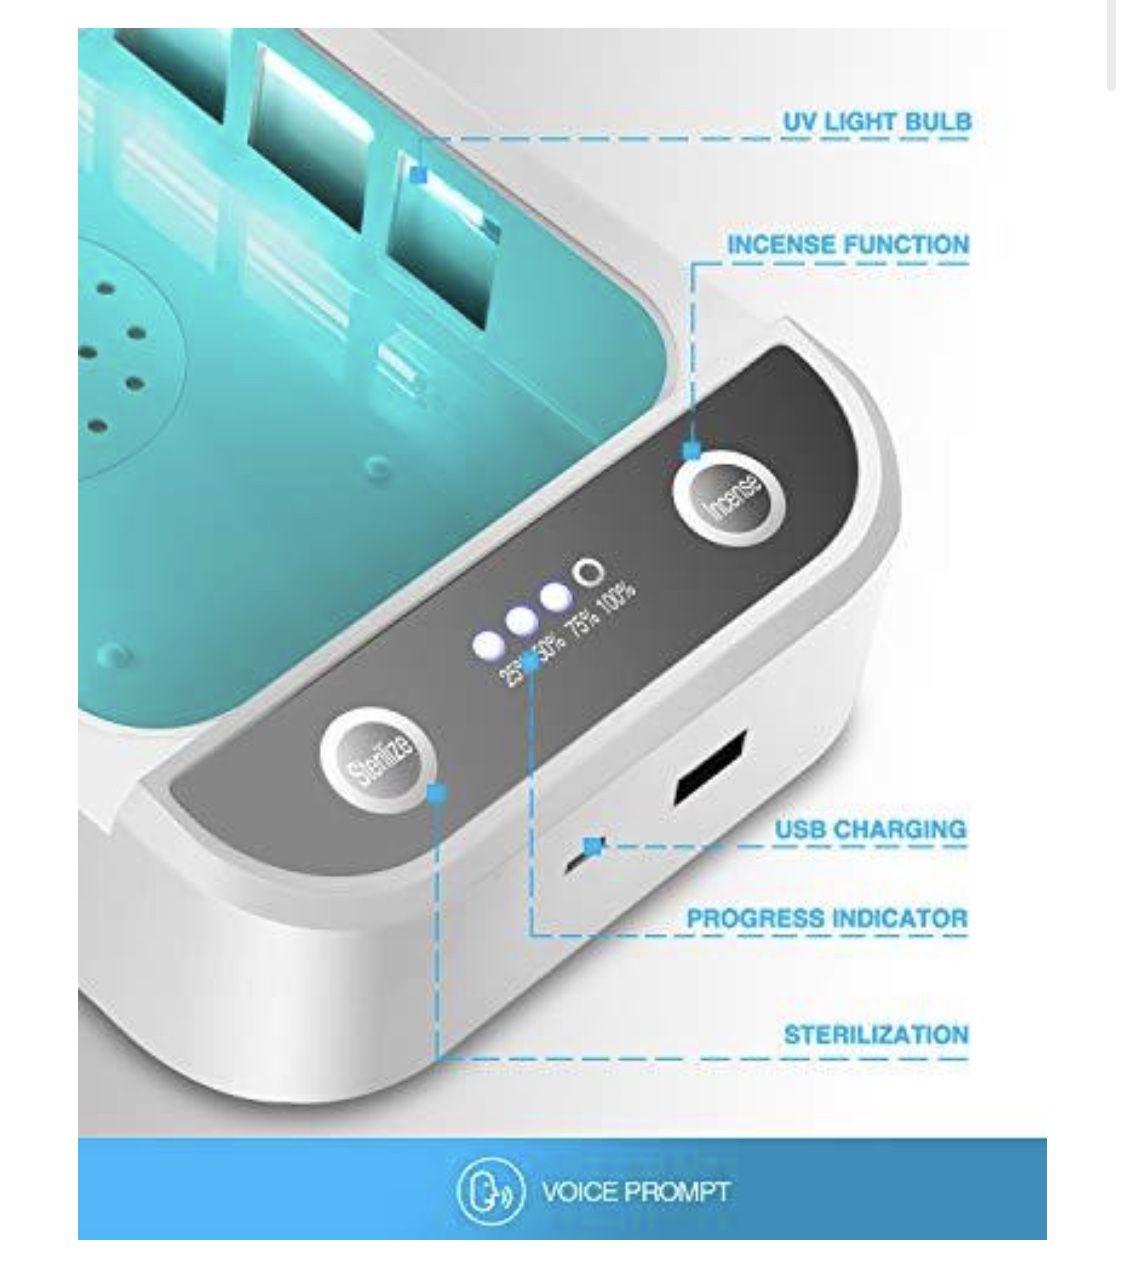 Brand New UV Light Disinfection Box, Disinfection Sterilization Box